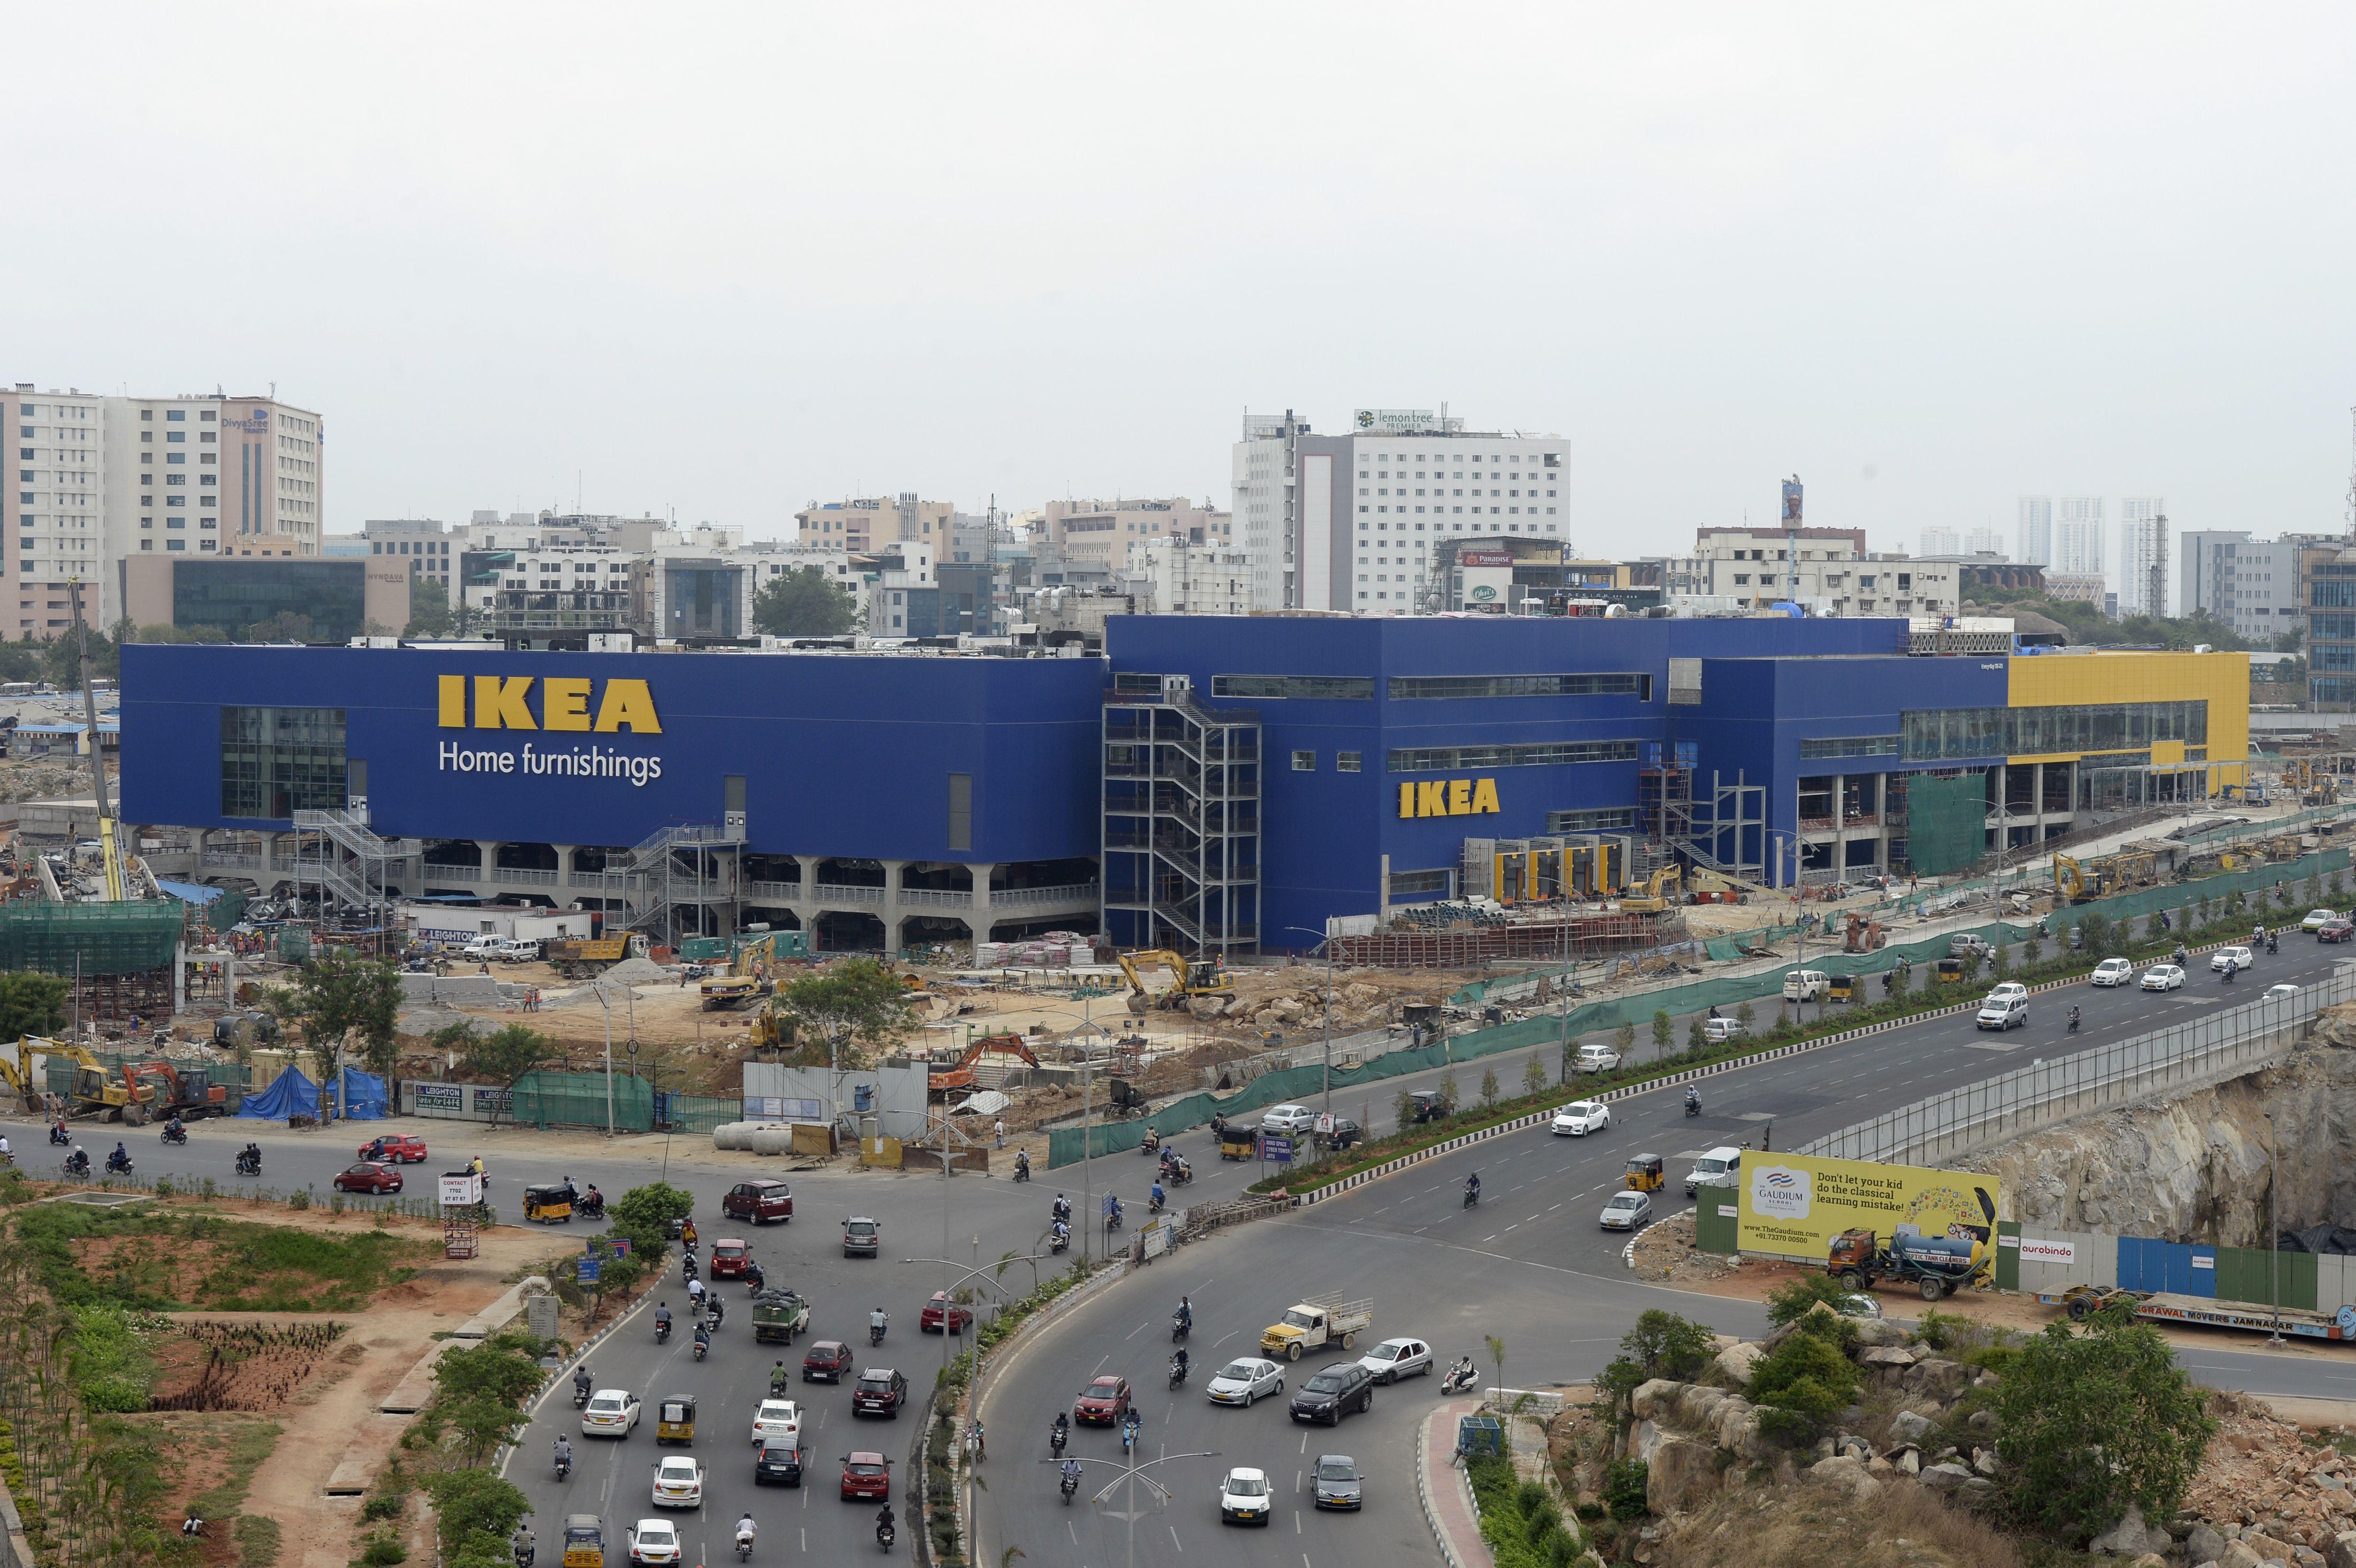 INDIA-SWEDEN-ECONOMY-RETAIL-IKEA